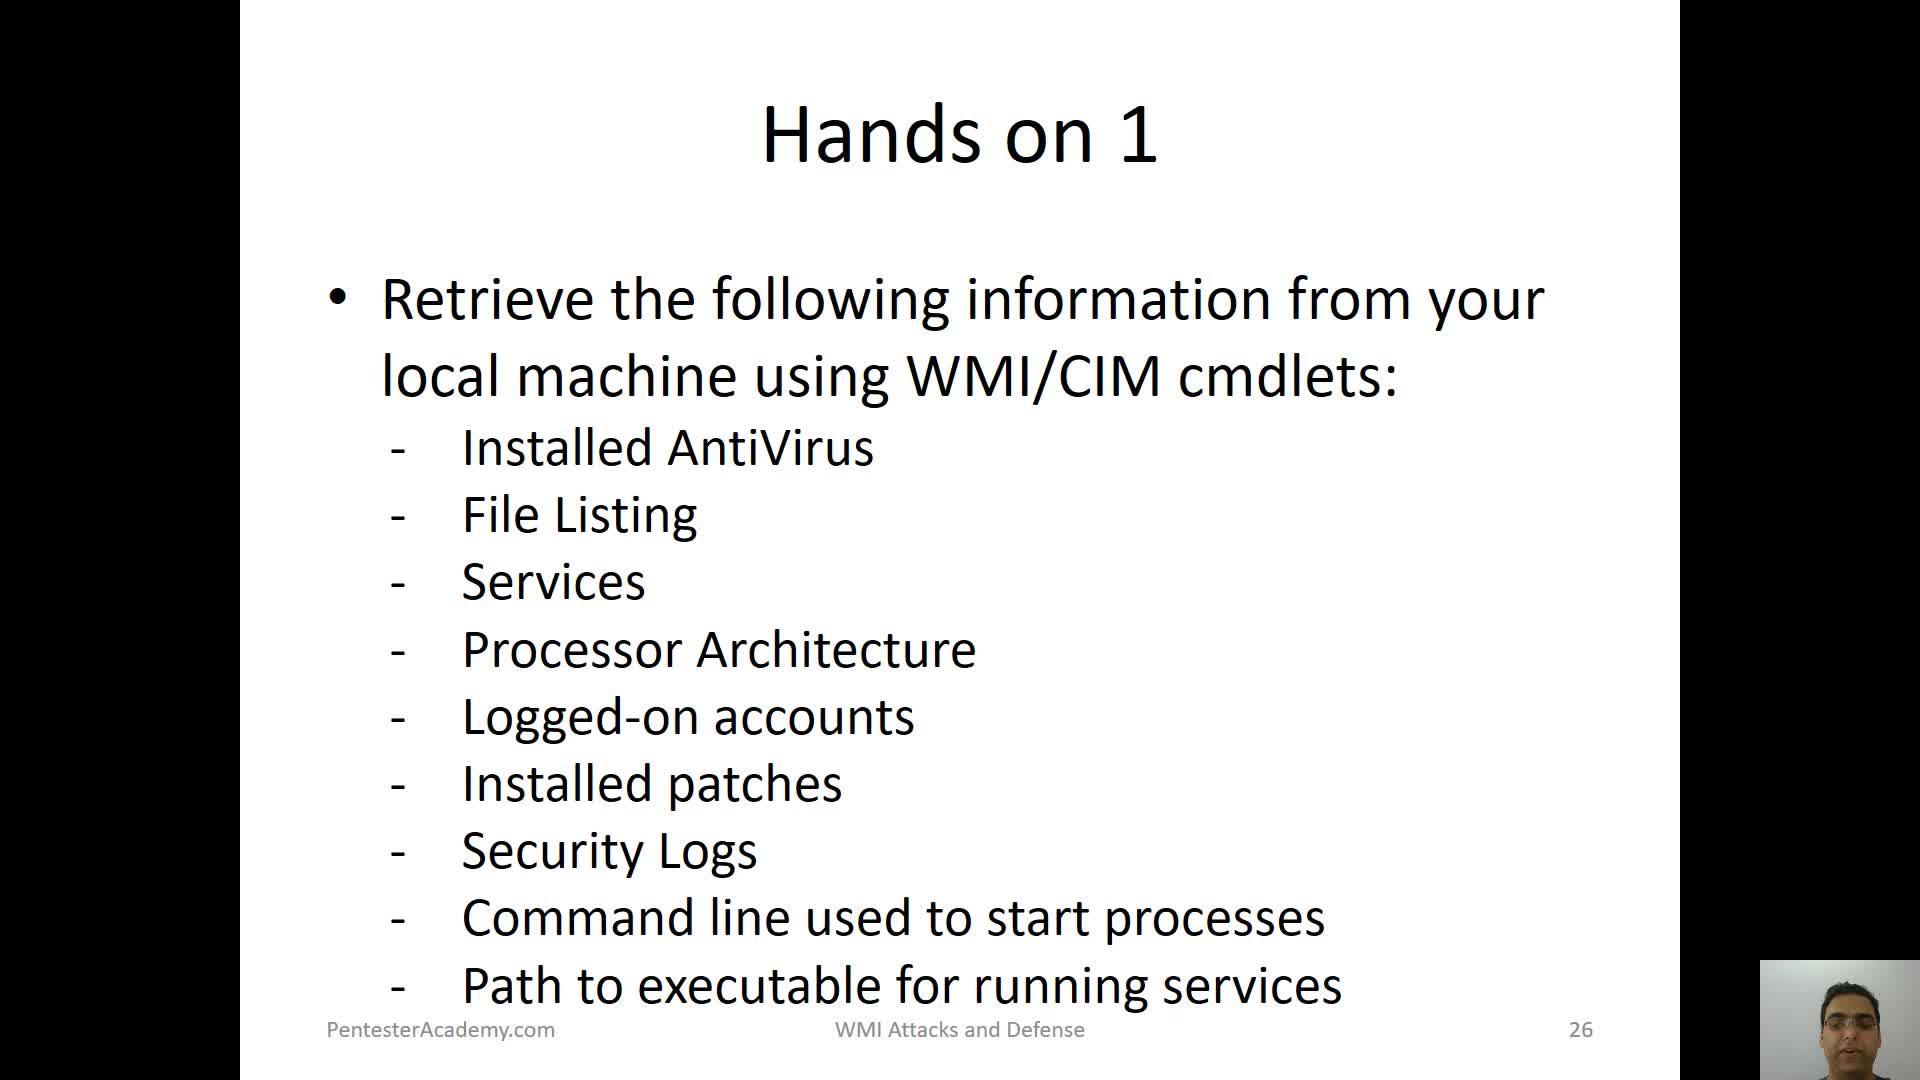 Using WMI Methods